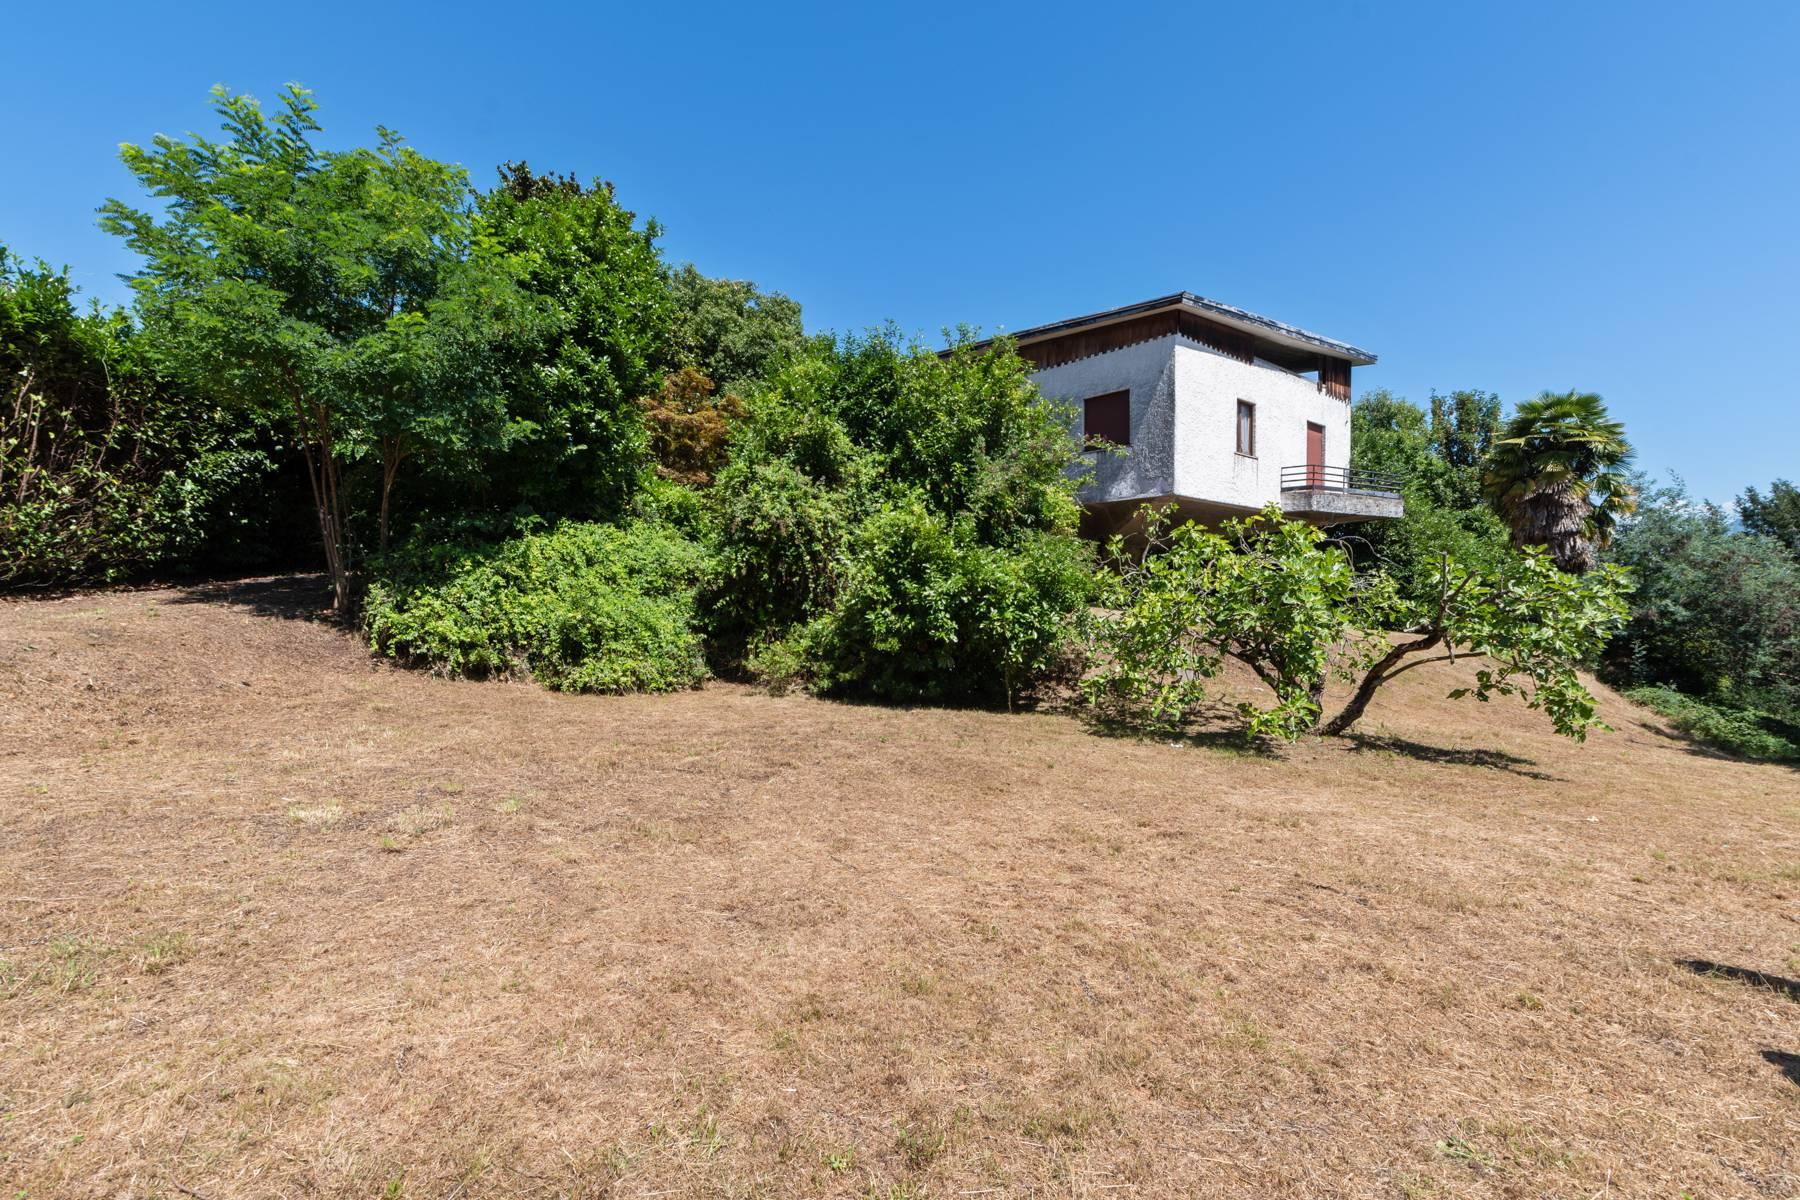 Villa in Vendita a Stresa: 5 locali, 150 mq - Foto 24